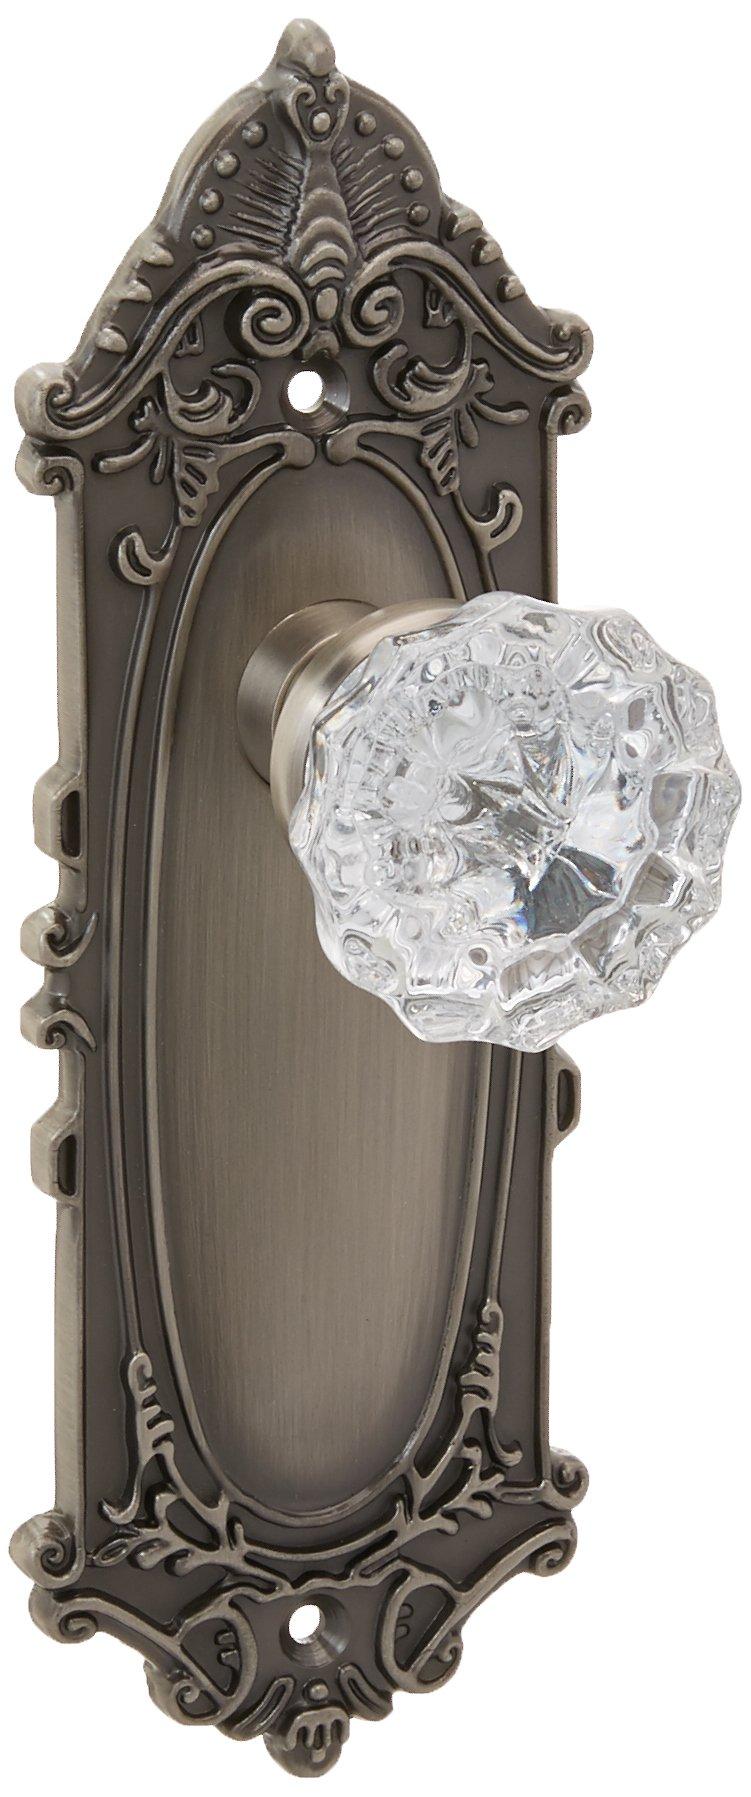 Nostalgic Warehouse Victorian Plate with Keyhole Crystal Glass Knob, Single Dummy, Antique Pewter